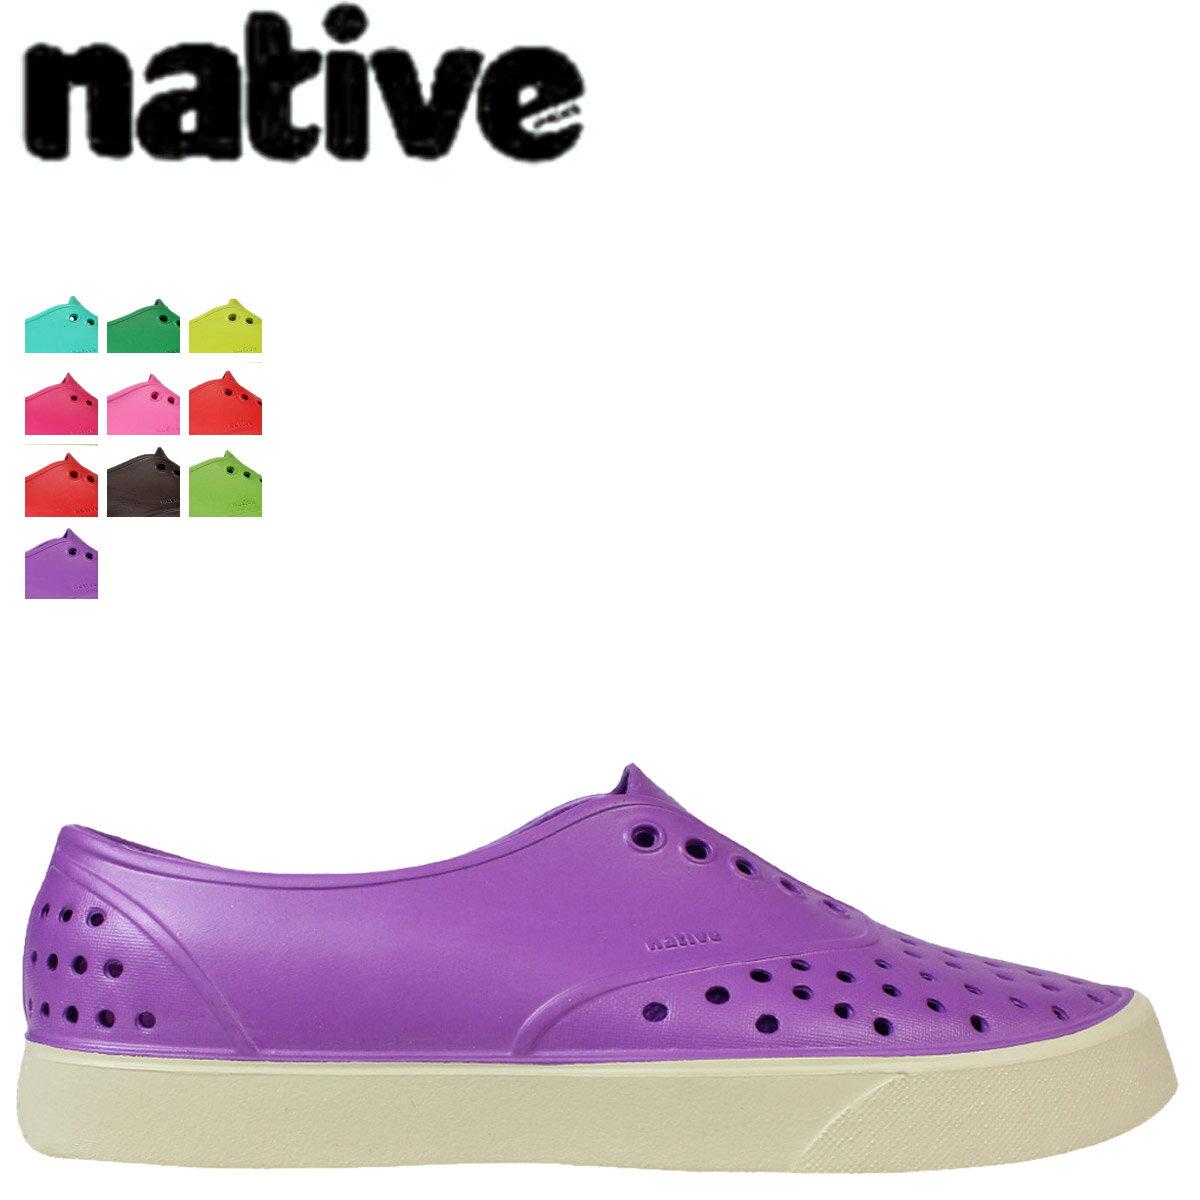 native native miller sandals shoes miller eva material men women